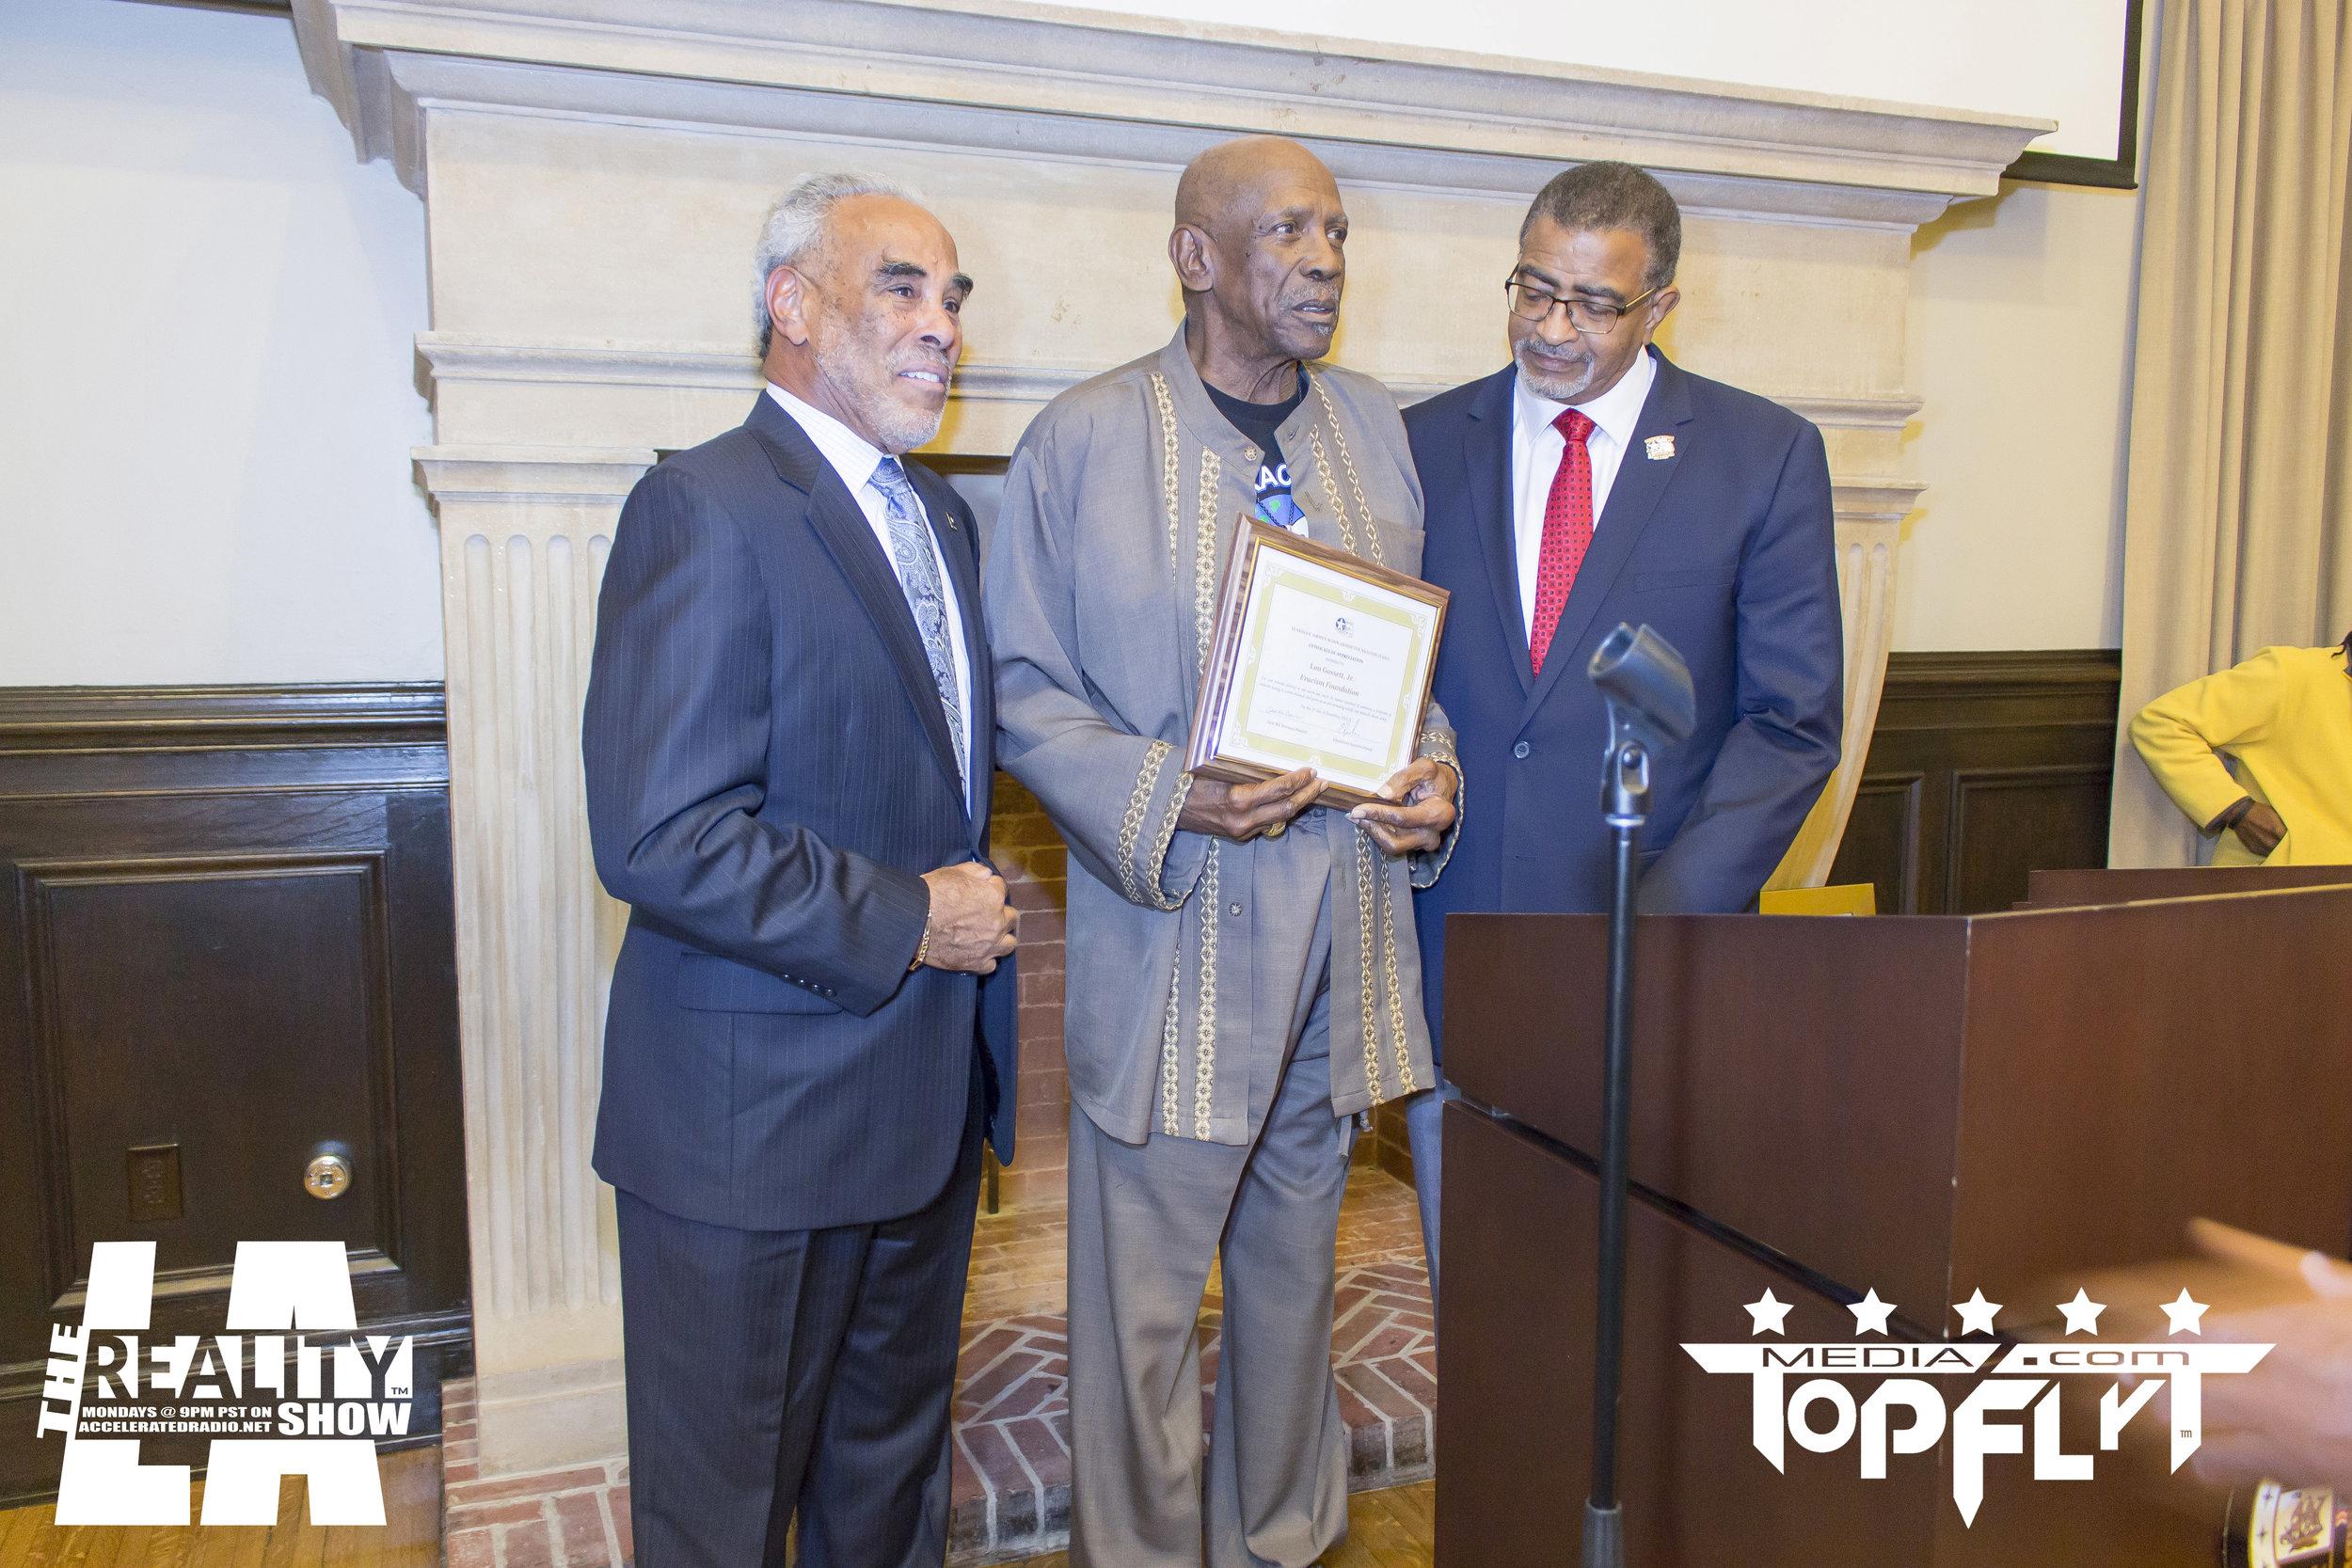 The Reality Show LA - Tuskegee Airmen 75th Anniversary VIP Reception_136.jpg